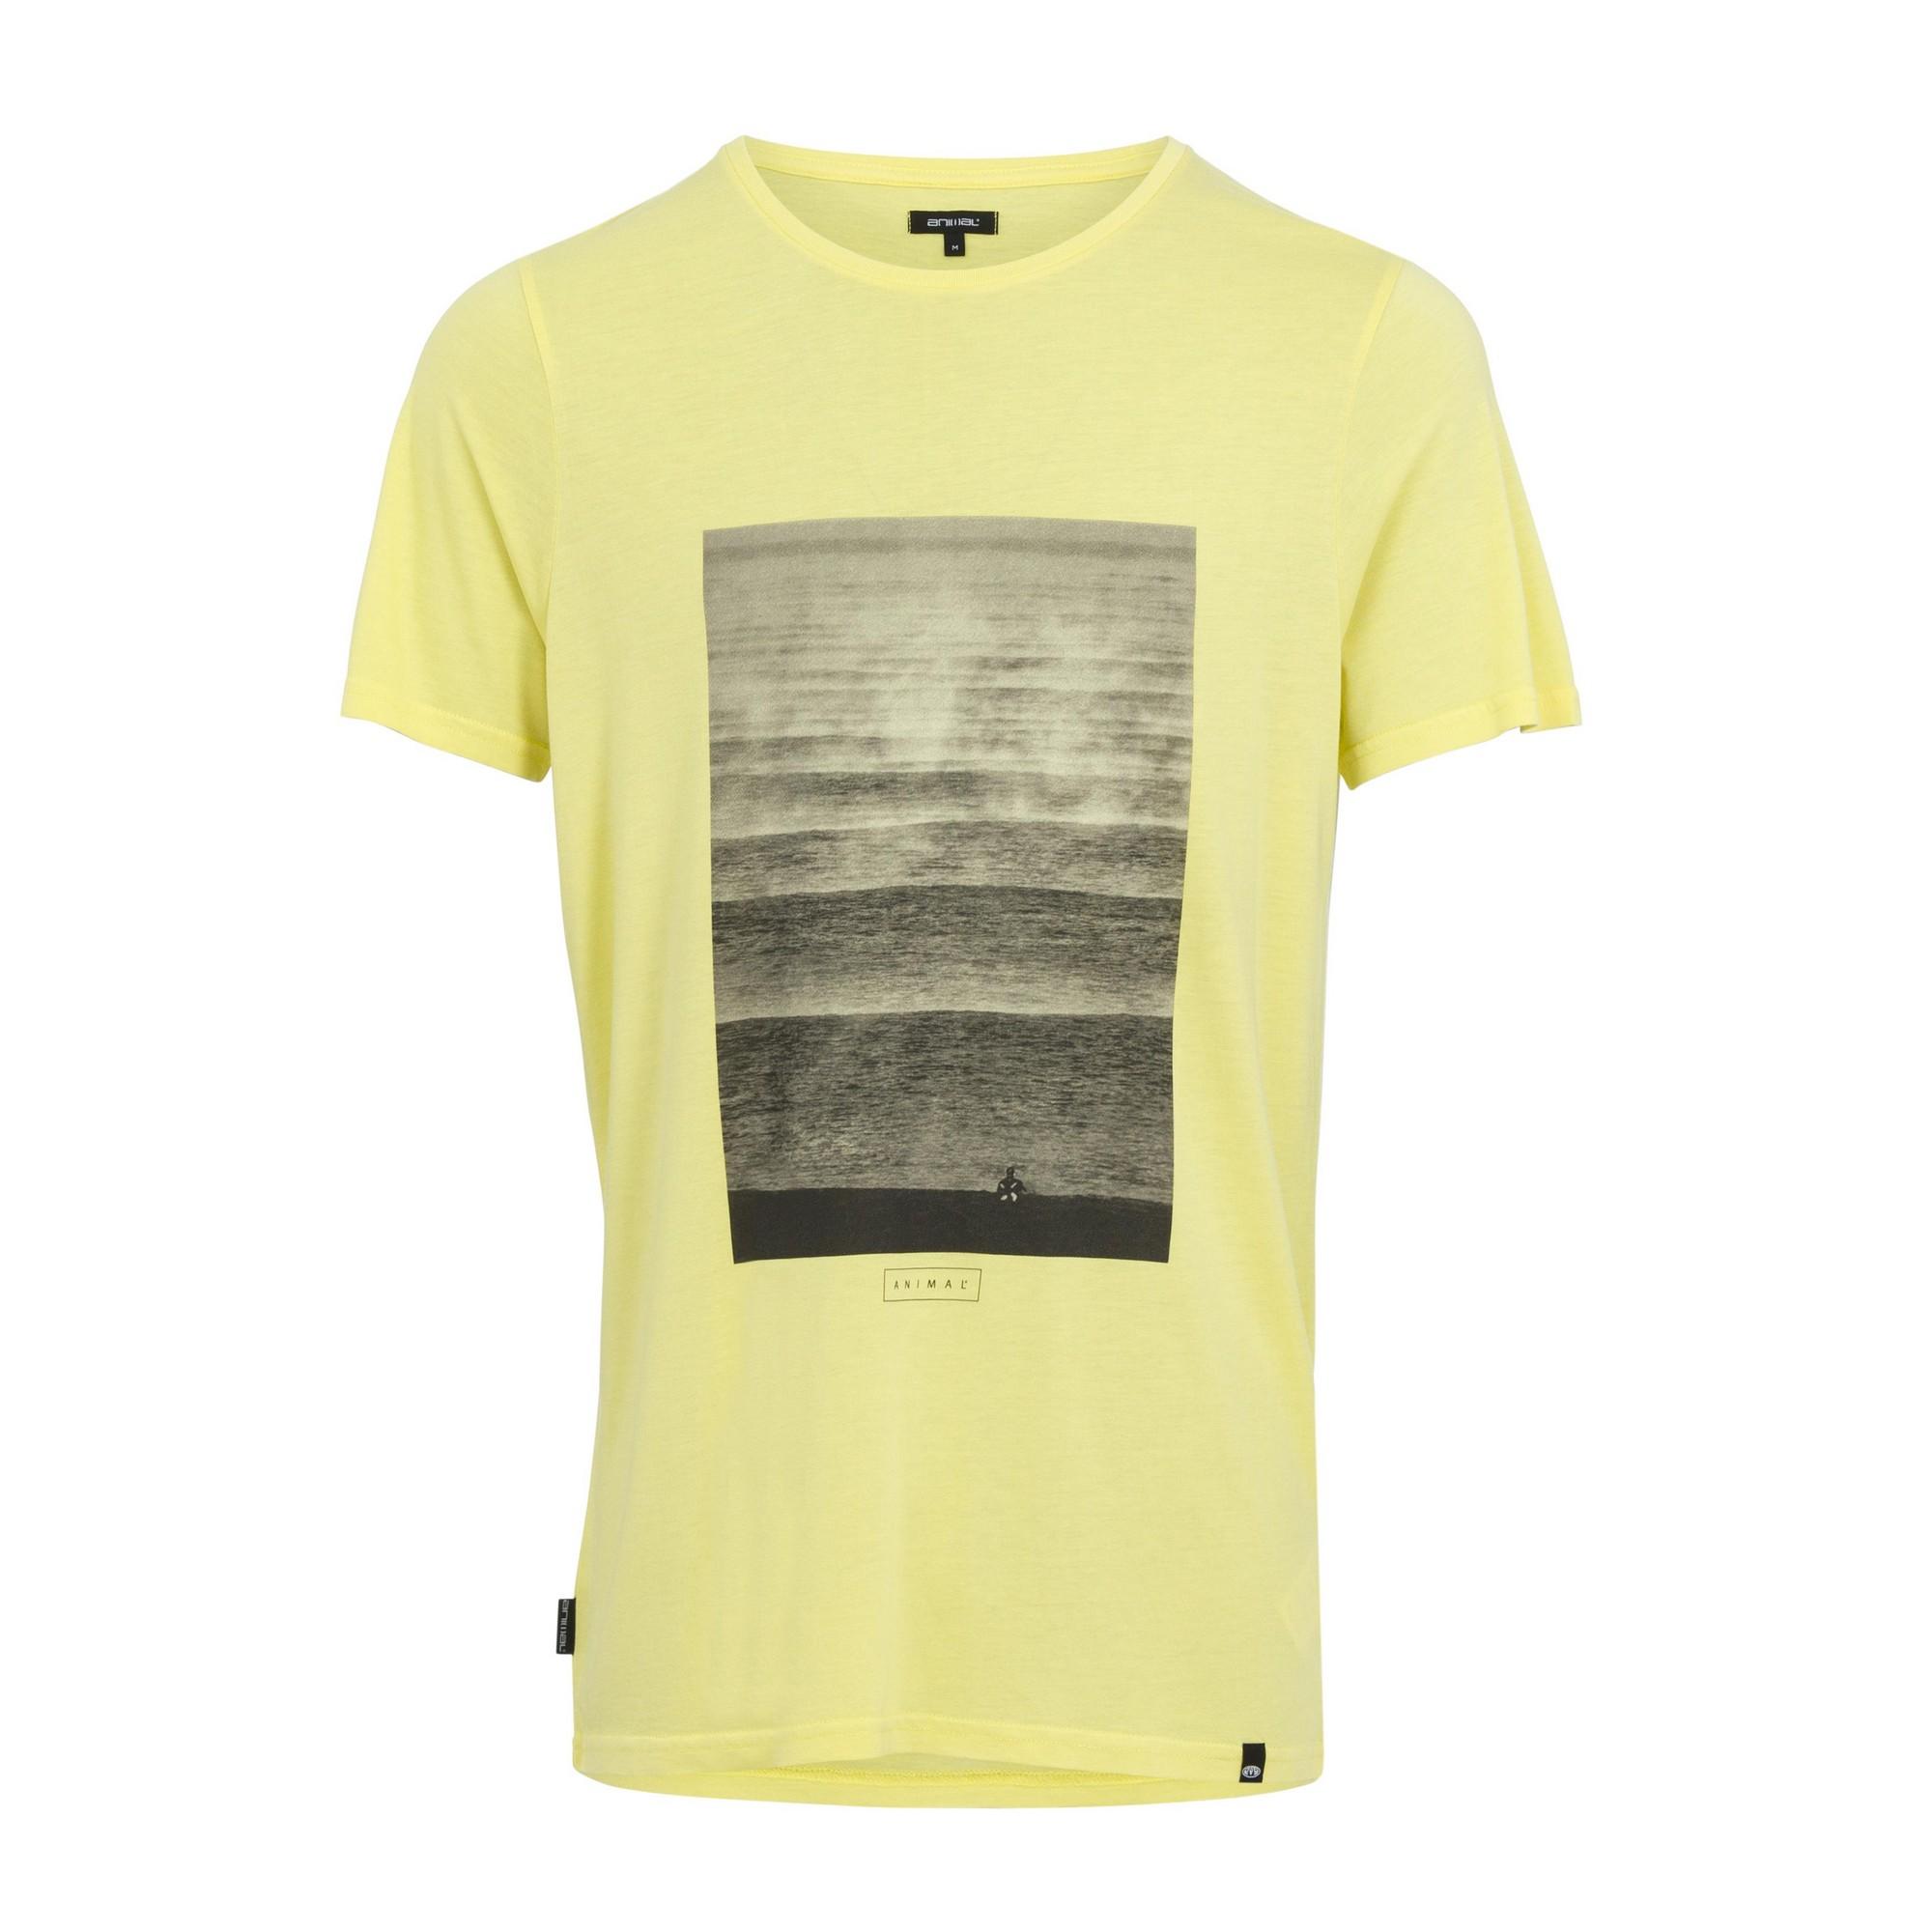 Animal-Camiseta-de-Manga-Corta-Diseno-Sets-para-Hombre